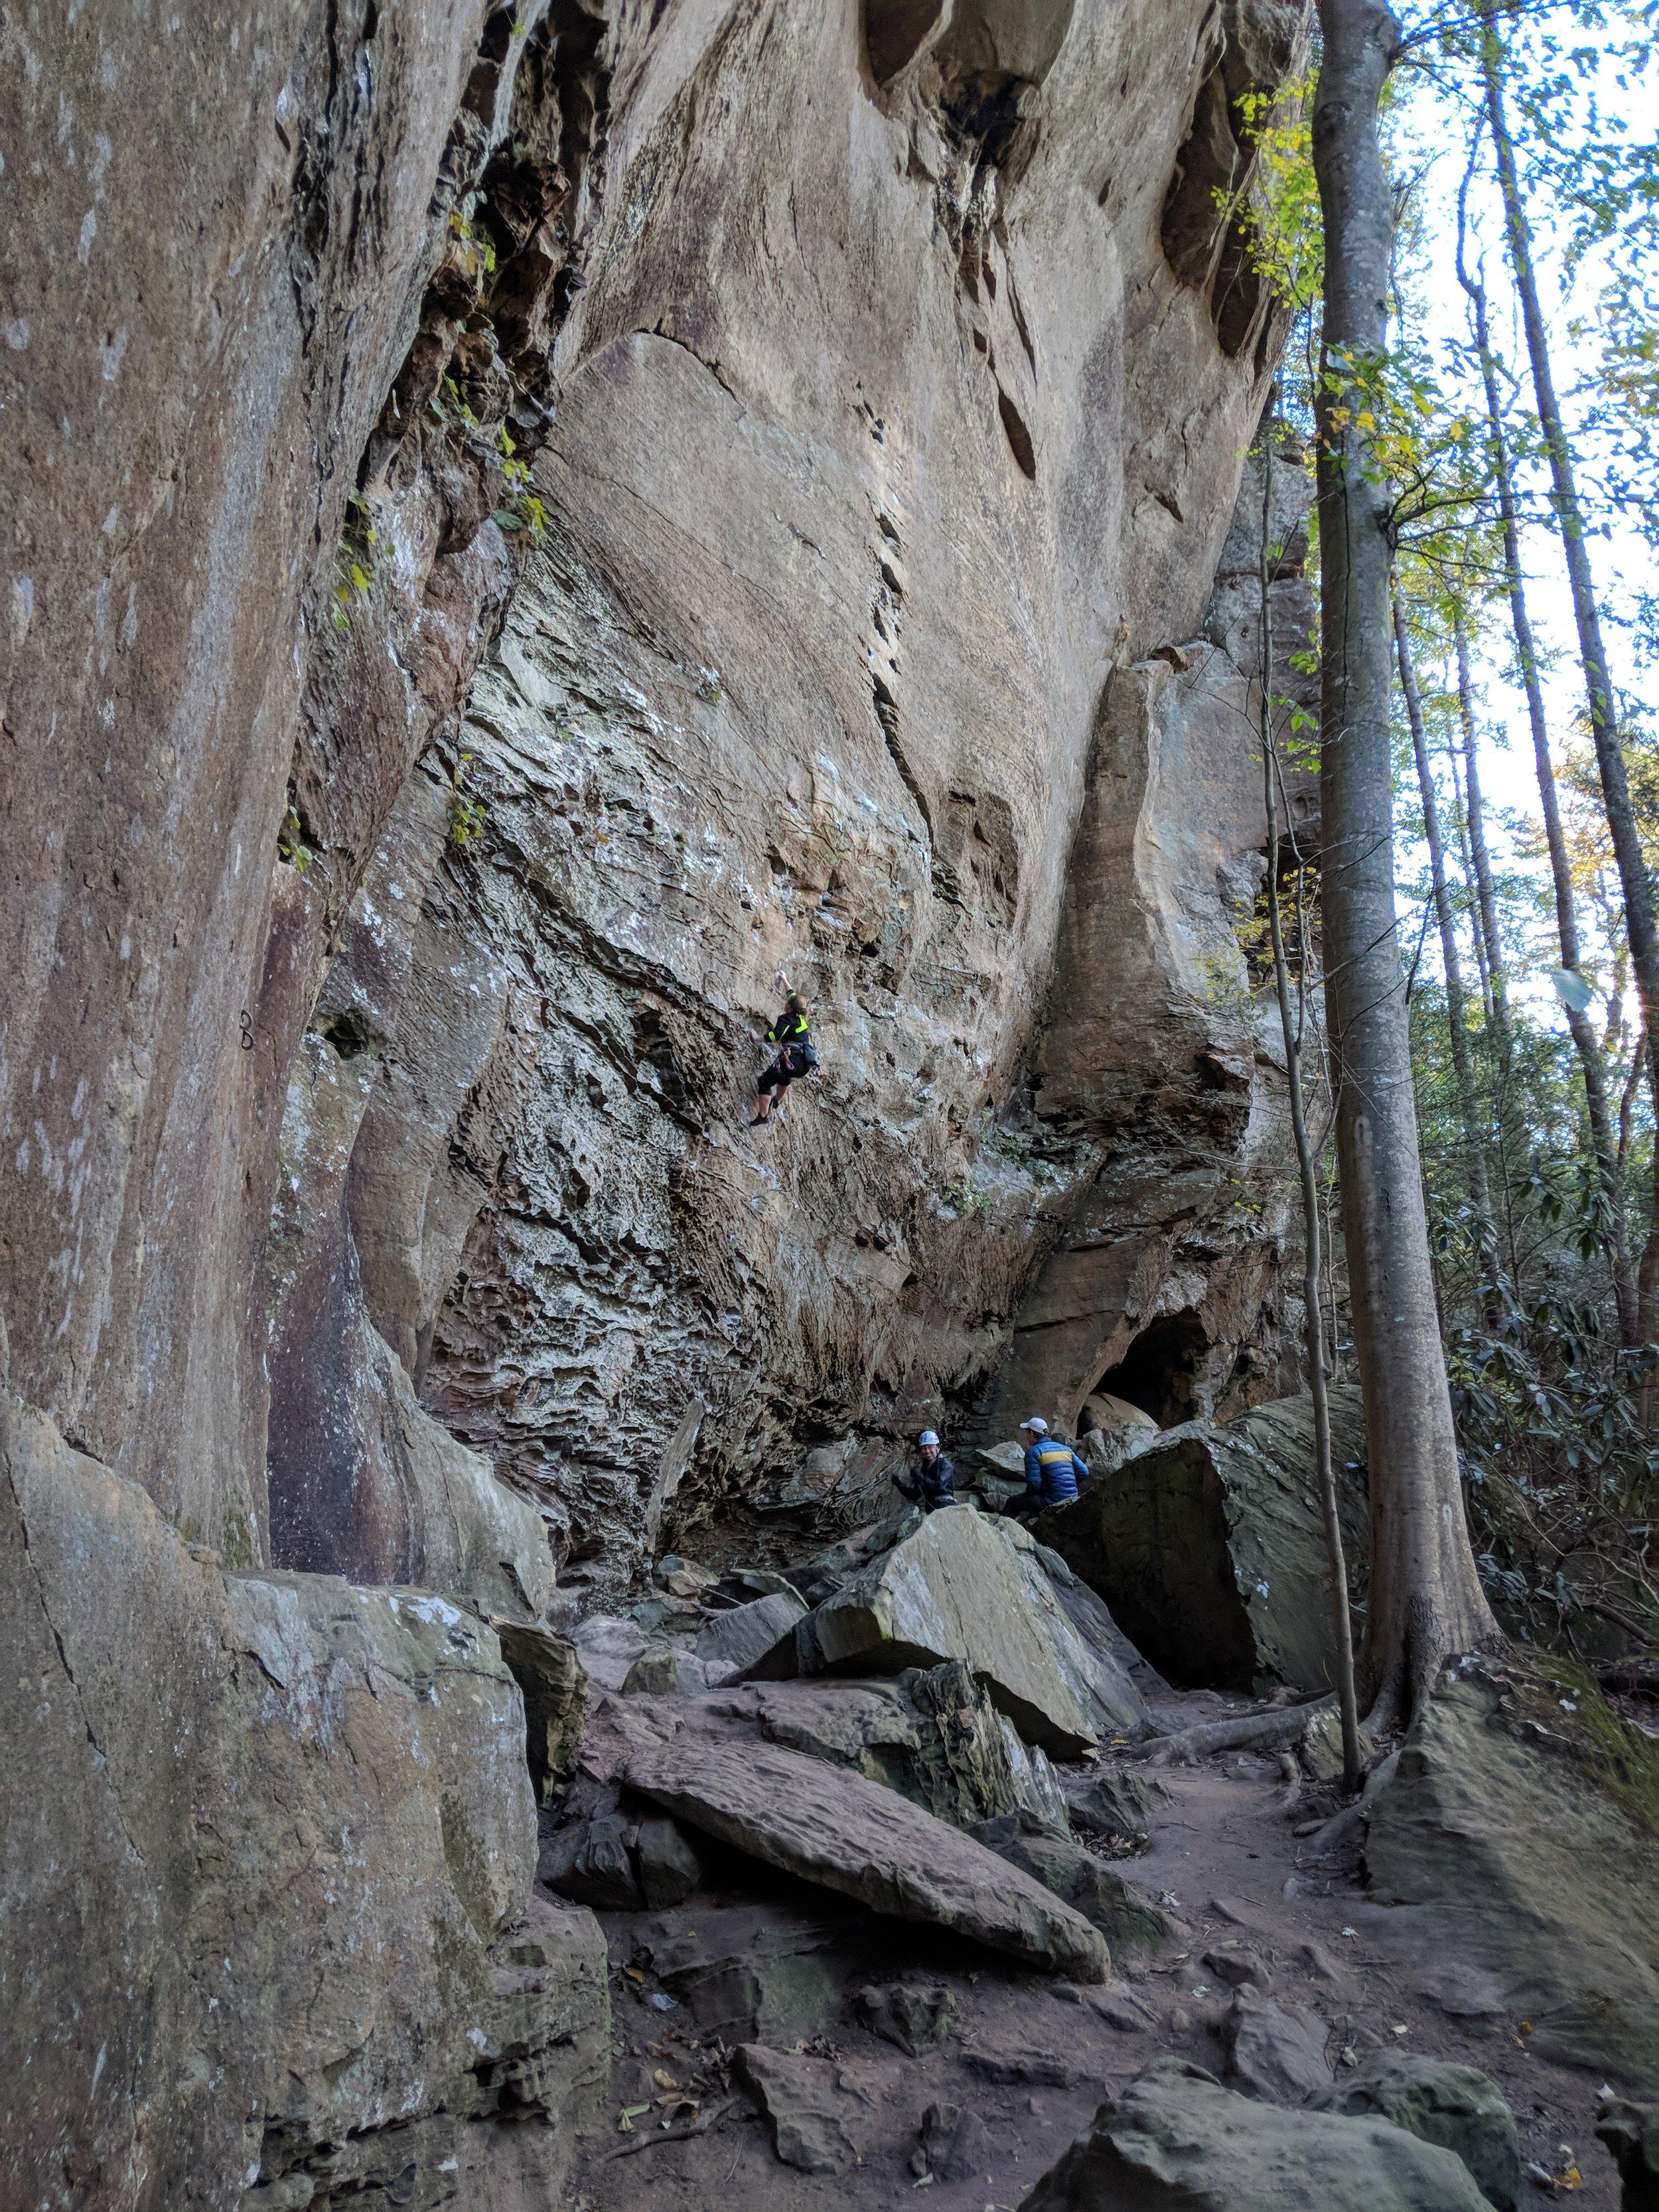 climbing-epic-trip-adventure-guide.jpg